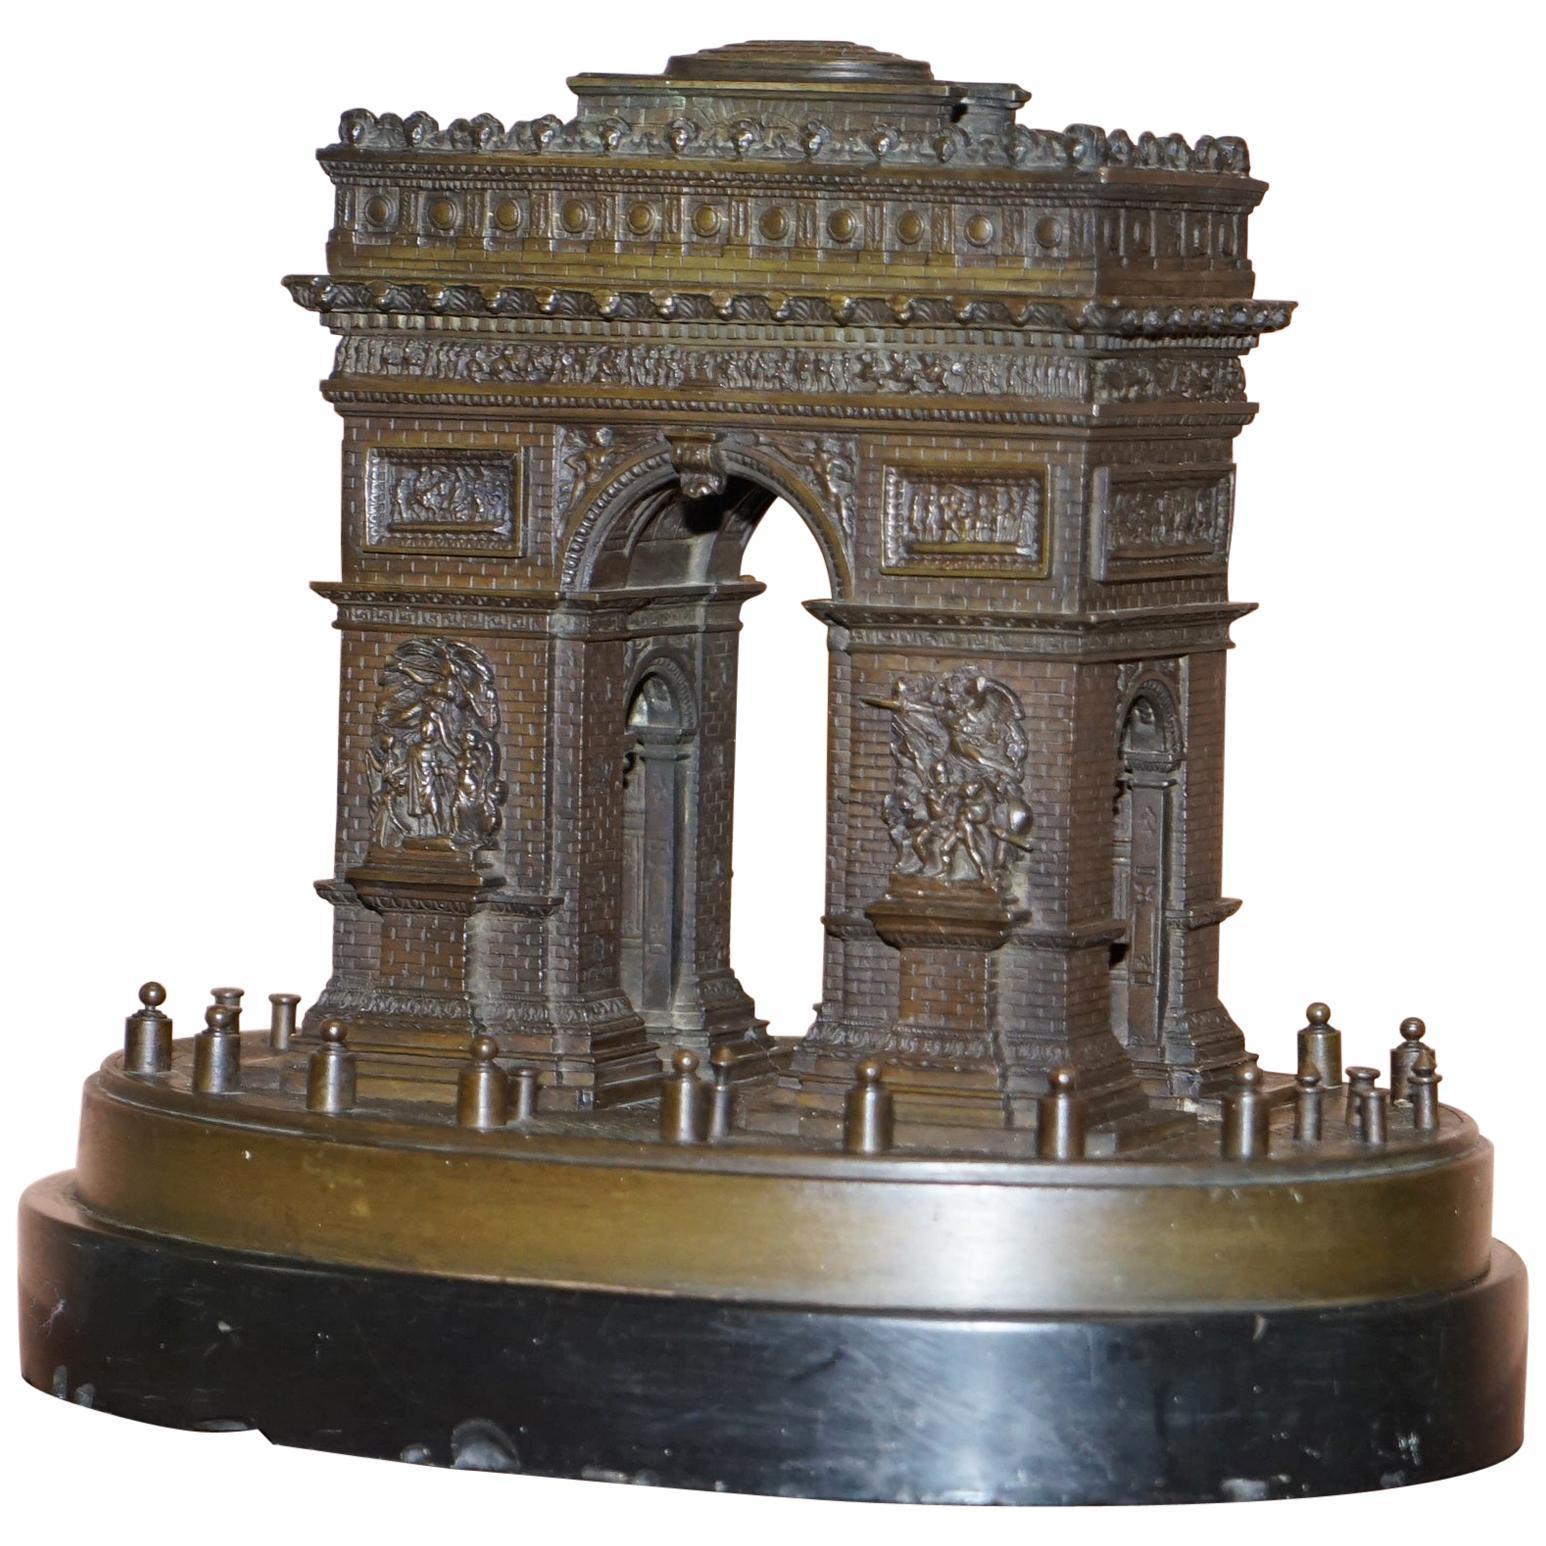 Rare 19th Century Leblanc Freres Grand Tour Bronze Statue of the Arc De Triomph